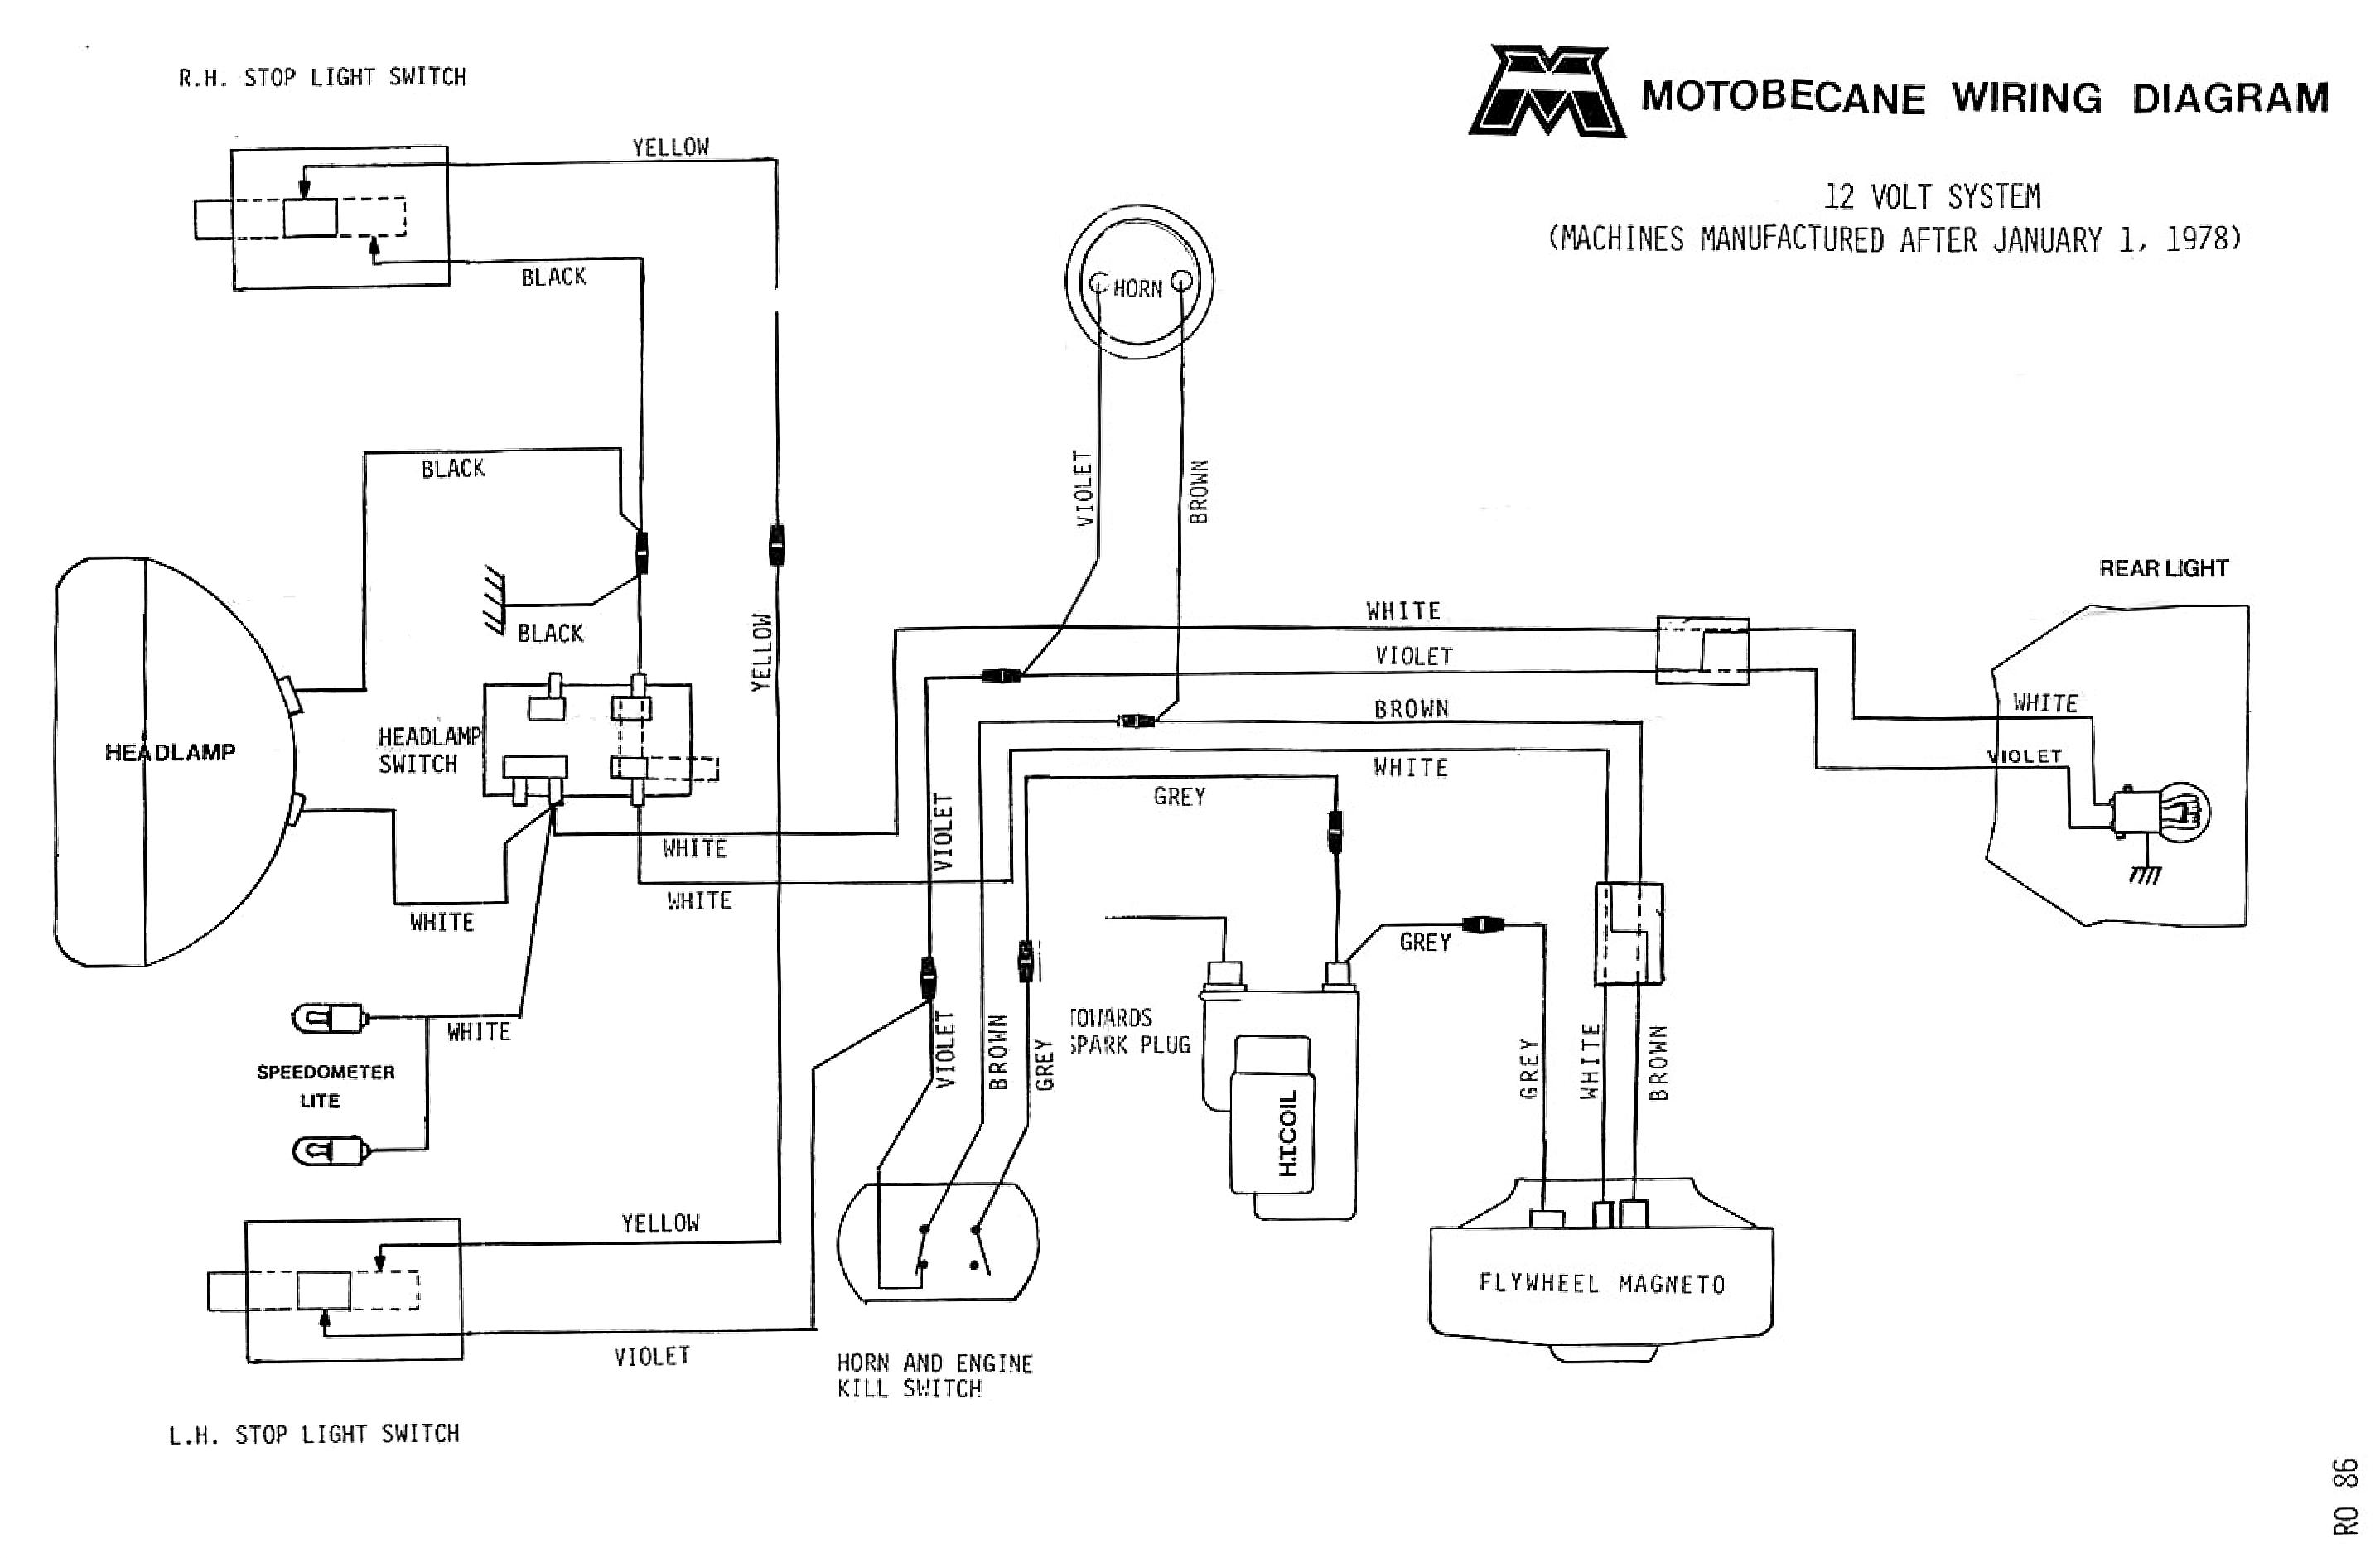 hight resolution of motobecane wiring diagrams mopedwiki mopeds wire diagram motobecane wiring diagrams mopedwiki